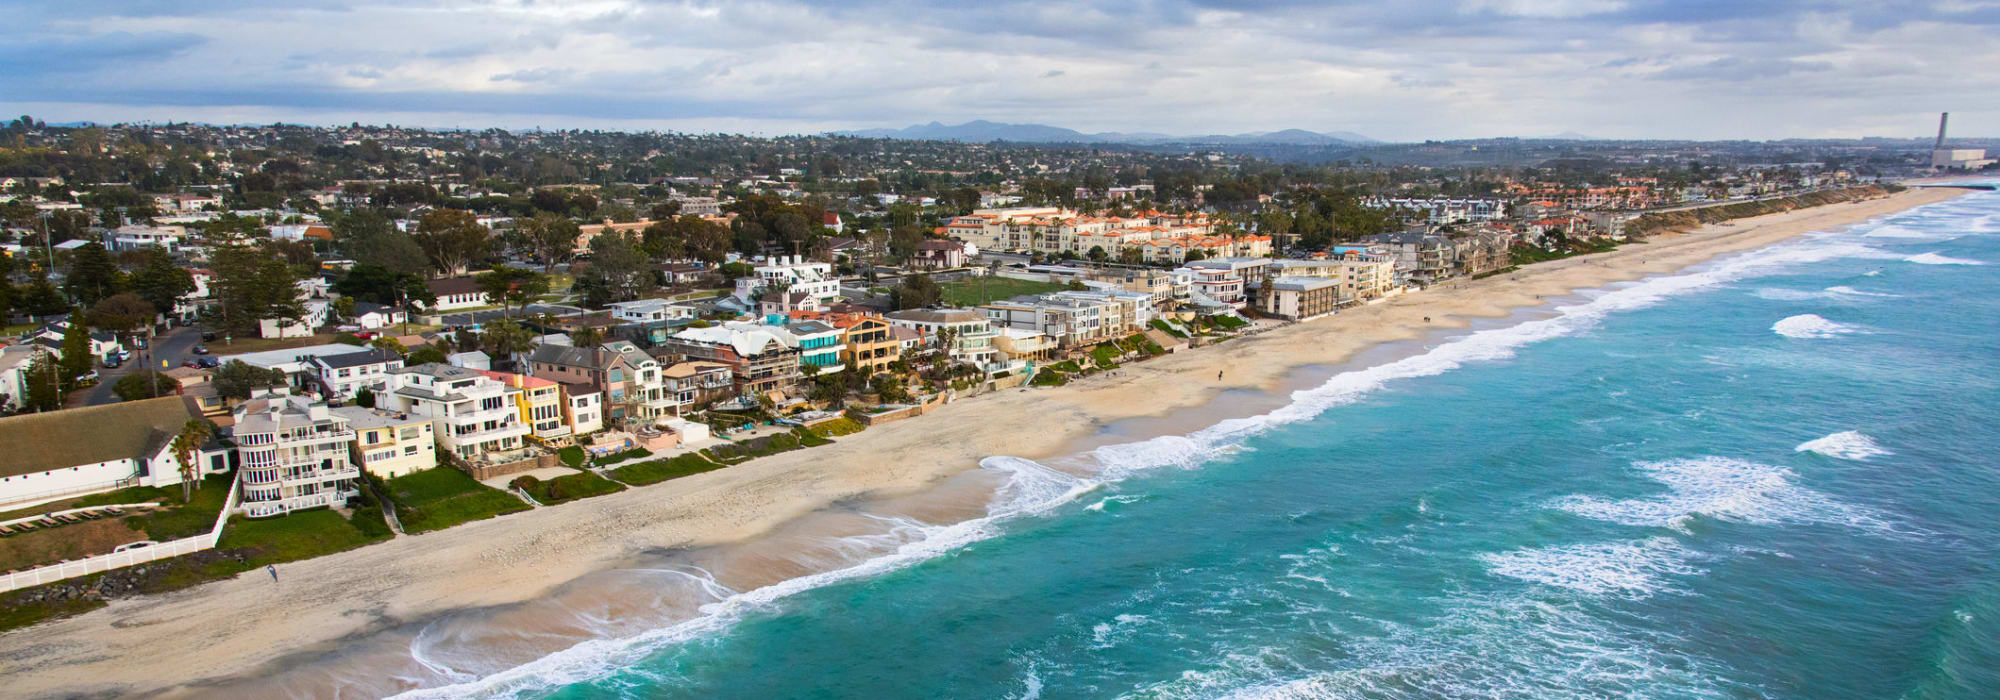 A beach near Golden Triangle Self Storage in San Diego, California